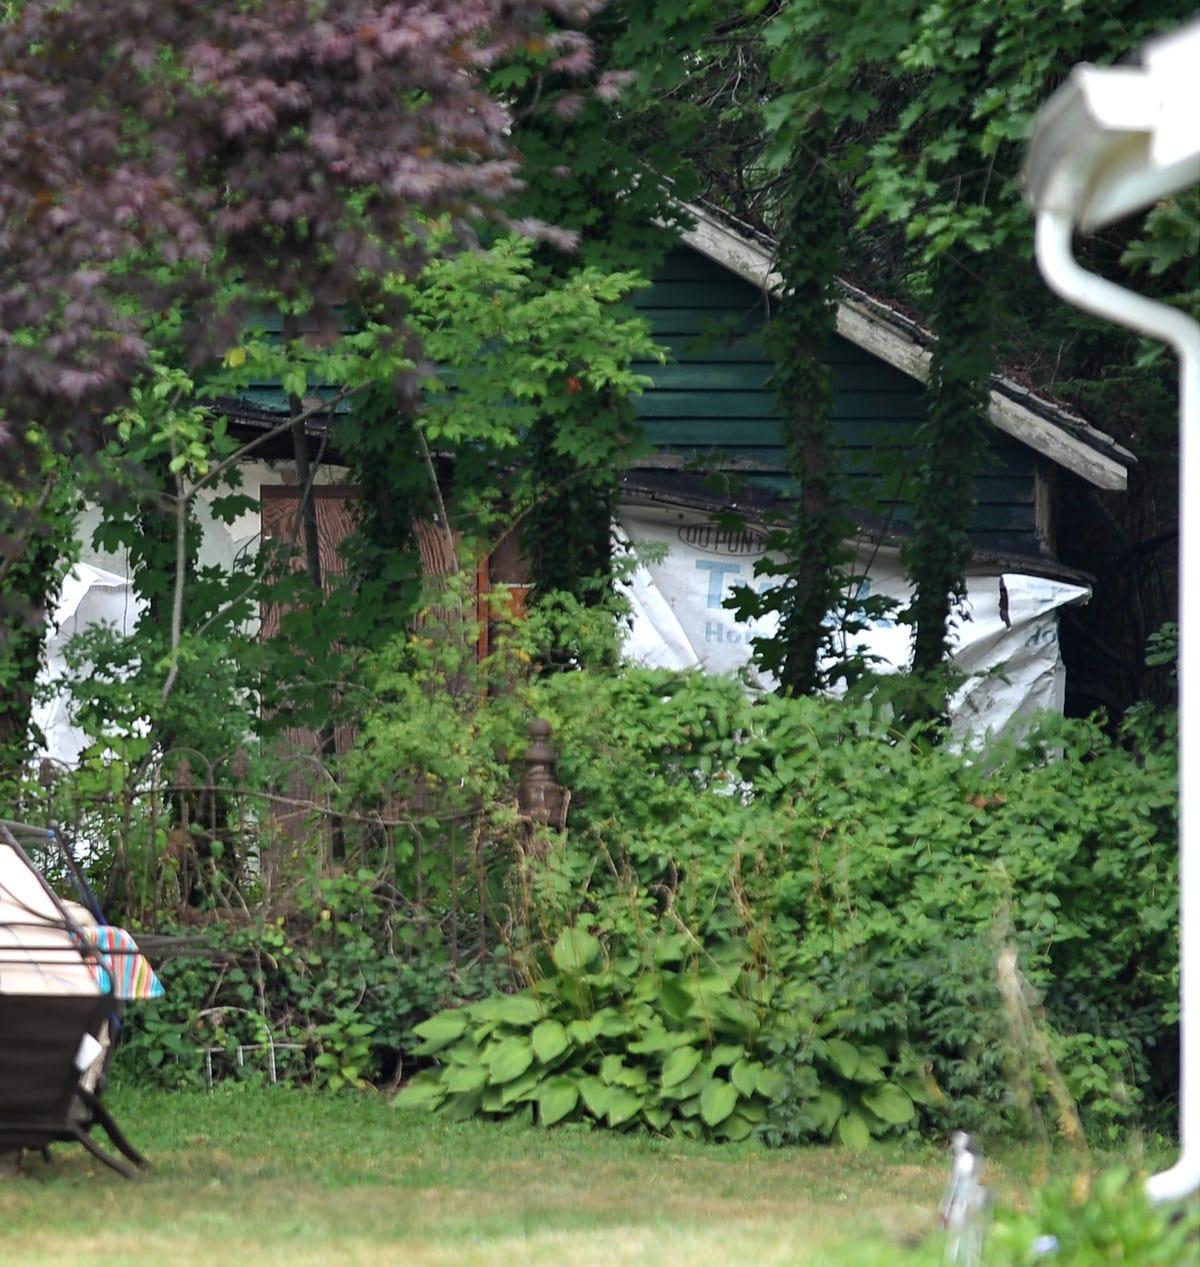 Skeleton in shed ID'd as long missing Vineland man